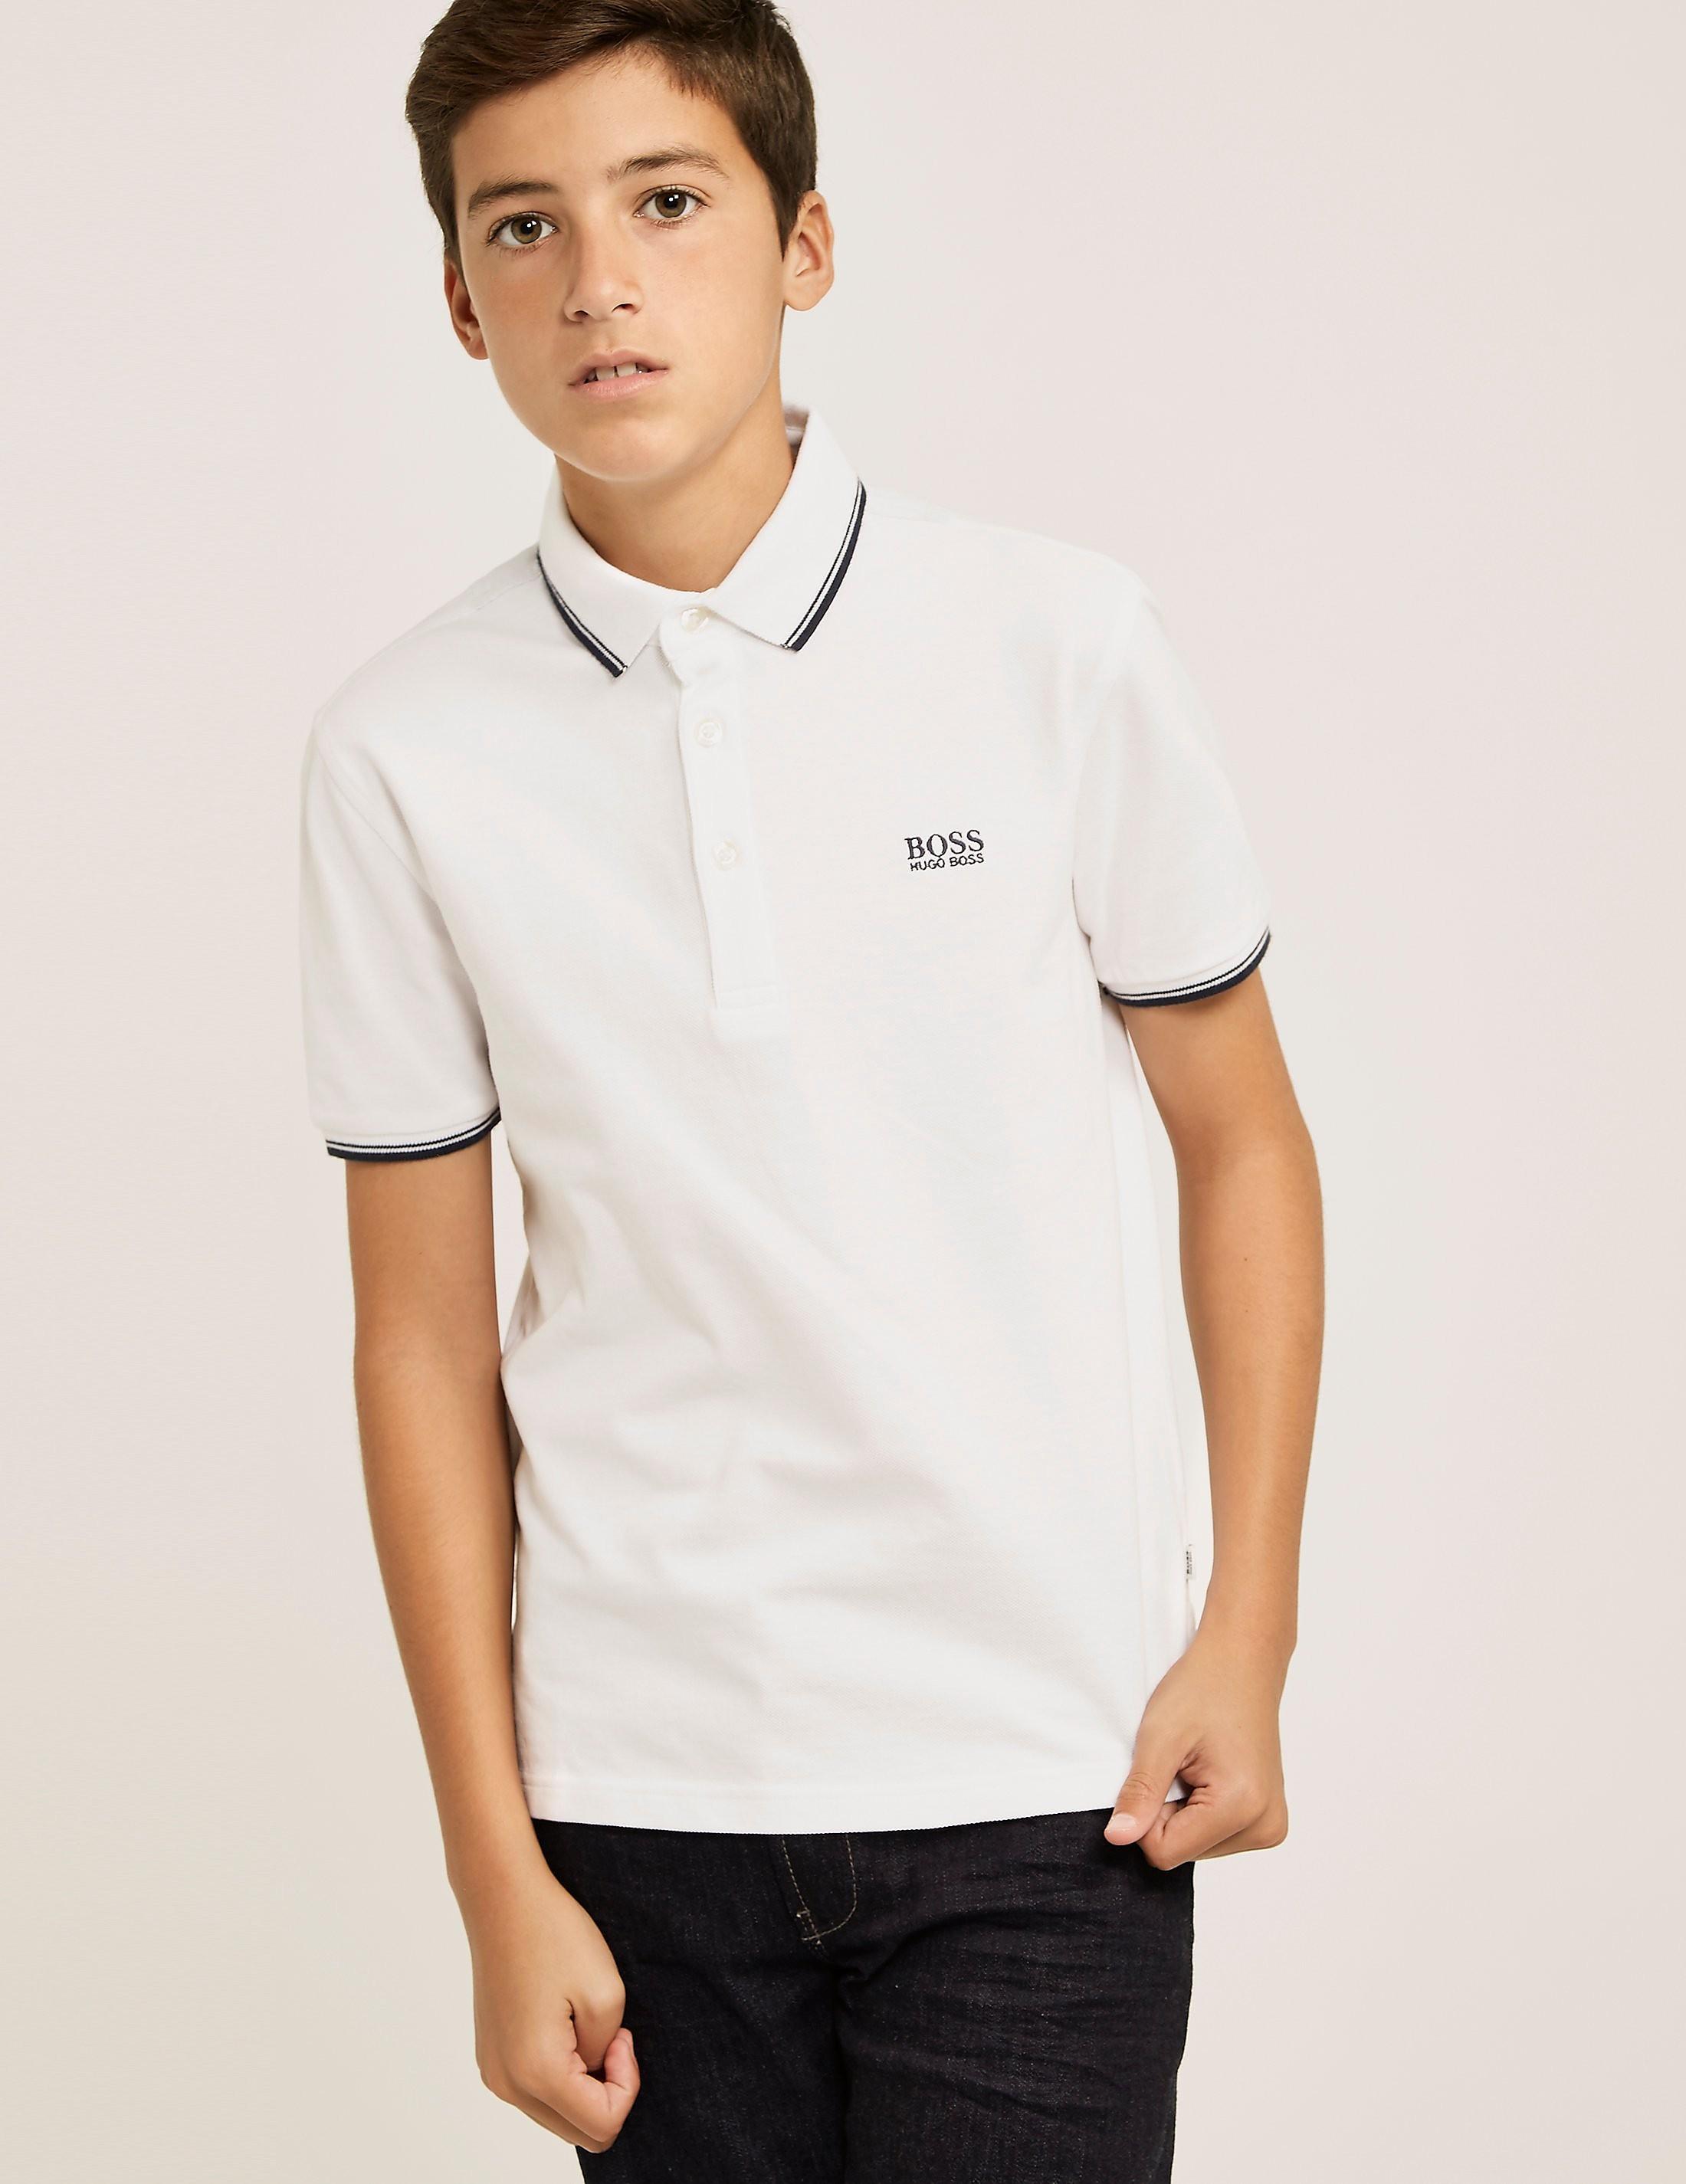 BOSS Tipped Collar Polo Shirt